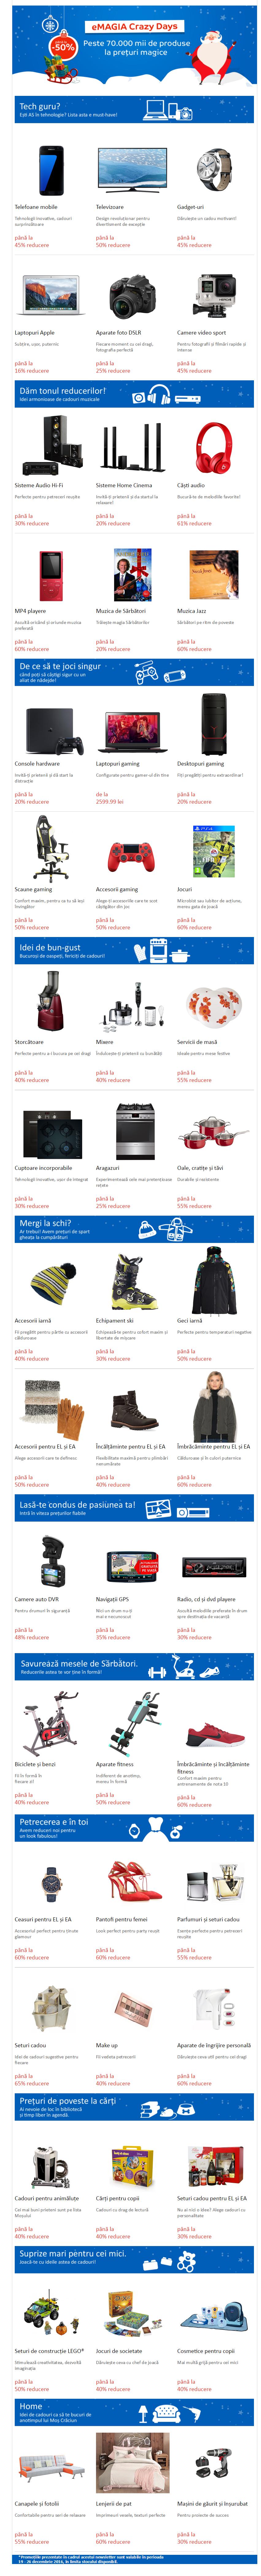 fireshot-capture-3-cadourile-potrivite-la-momentul-po_-http___m-newsletter-emag-ro_nl_jsp_m-jsp